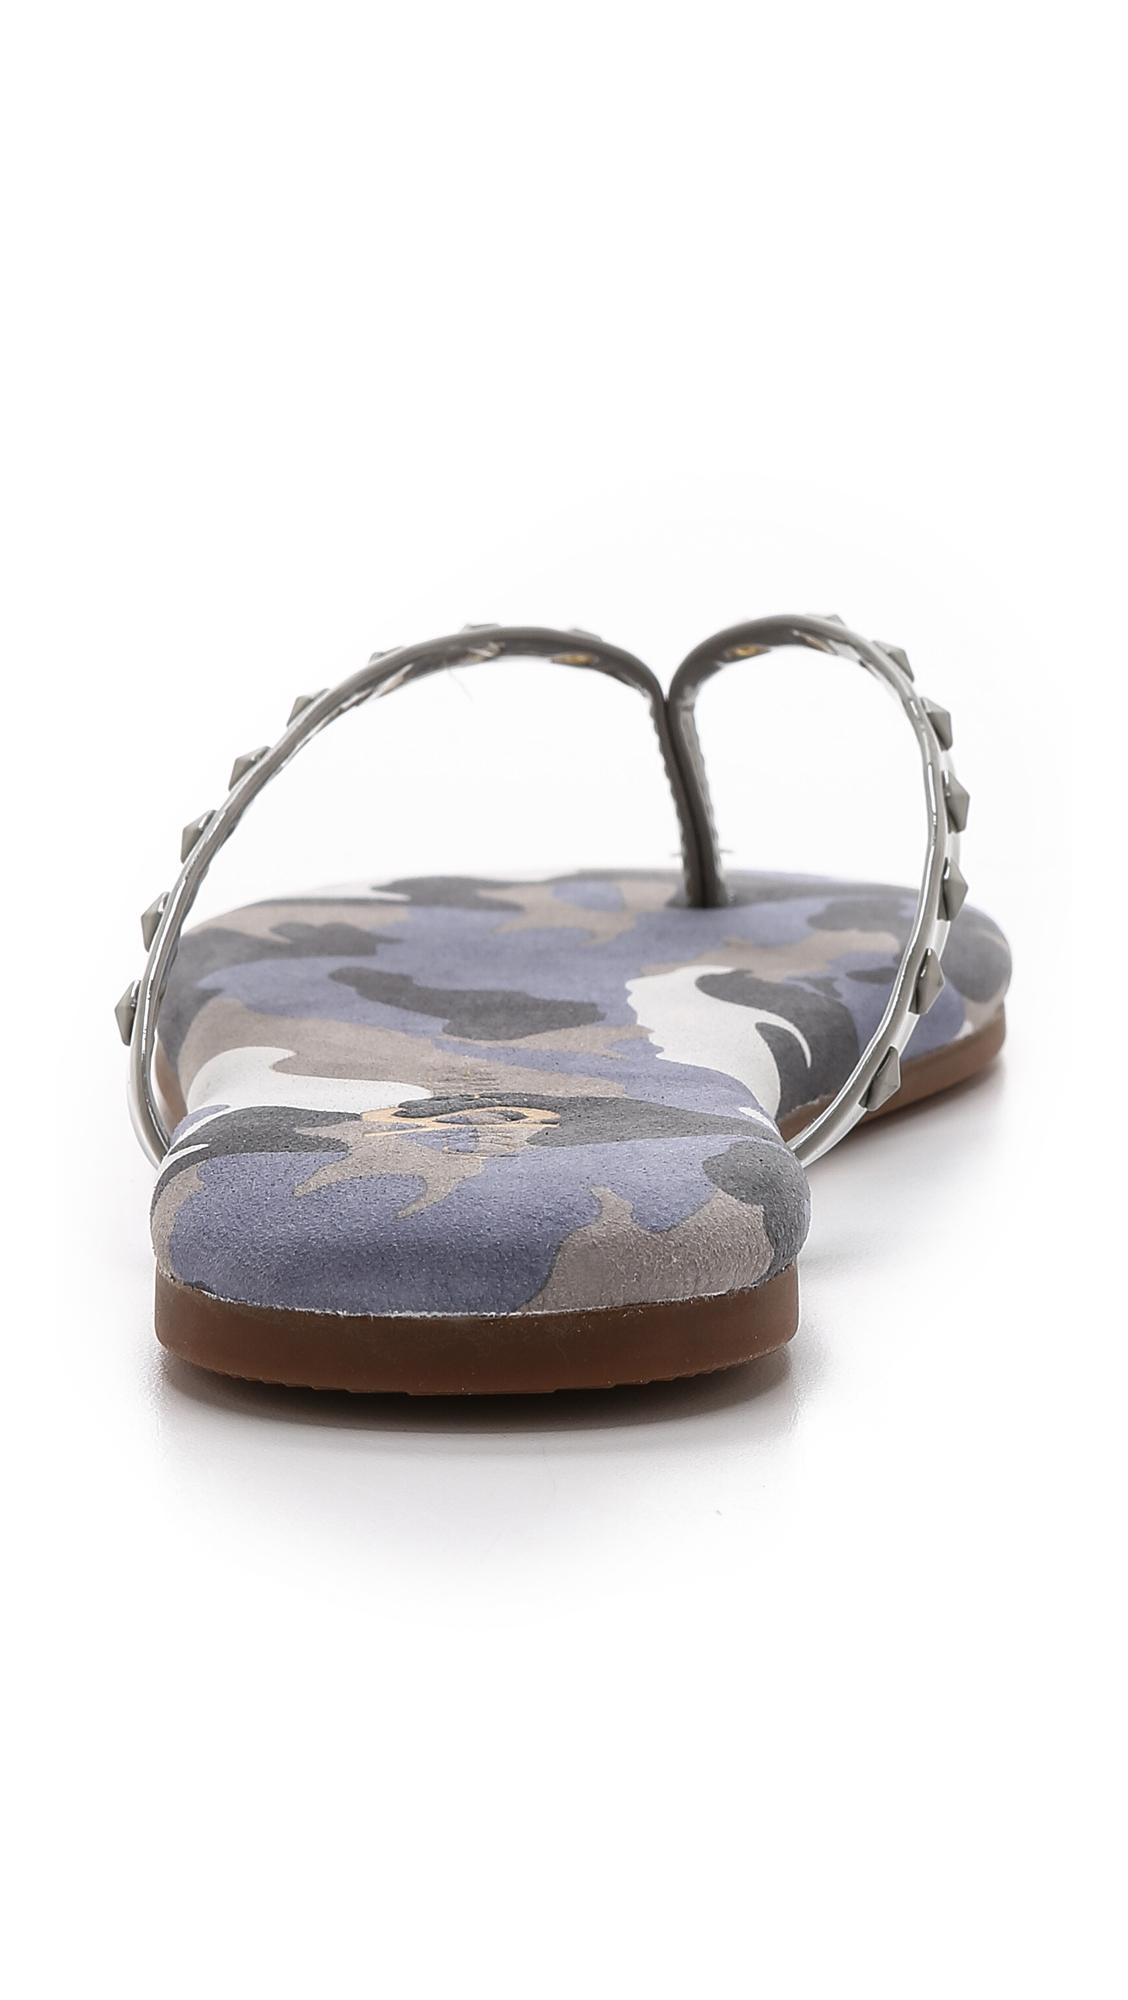 4ad3ecff0bbf1 Yosi Samra Roee Studded Camo Flip Flops - Limette in Blue - Lyst